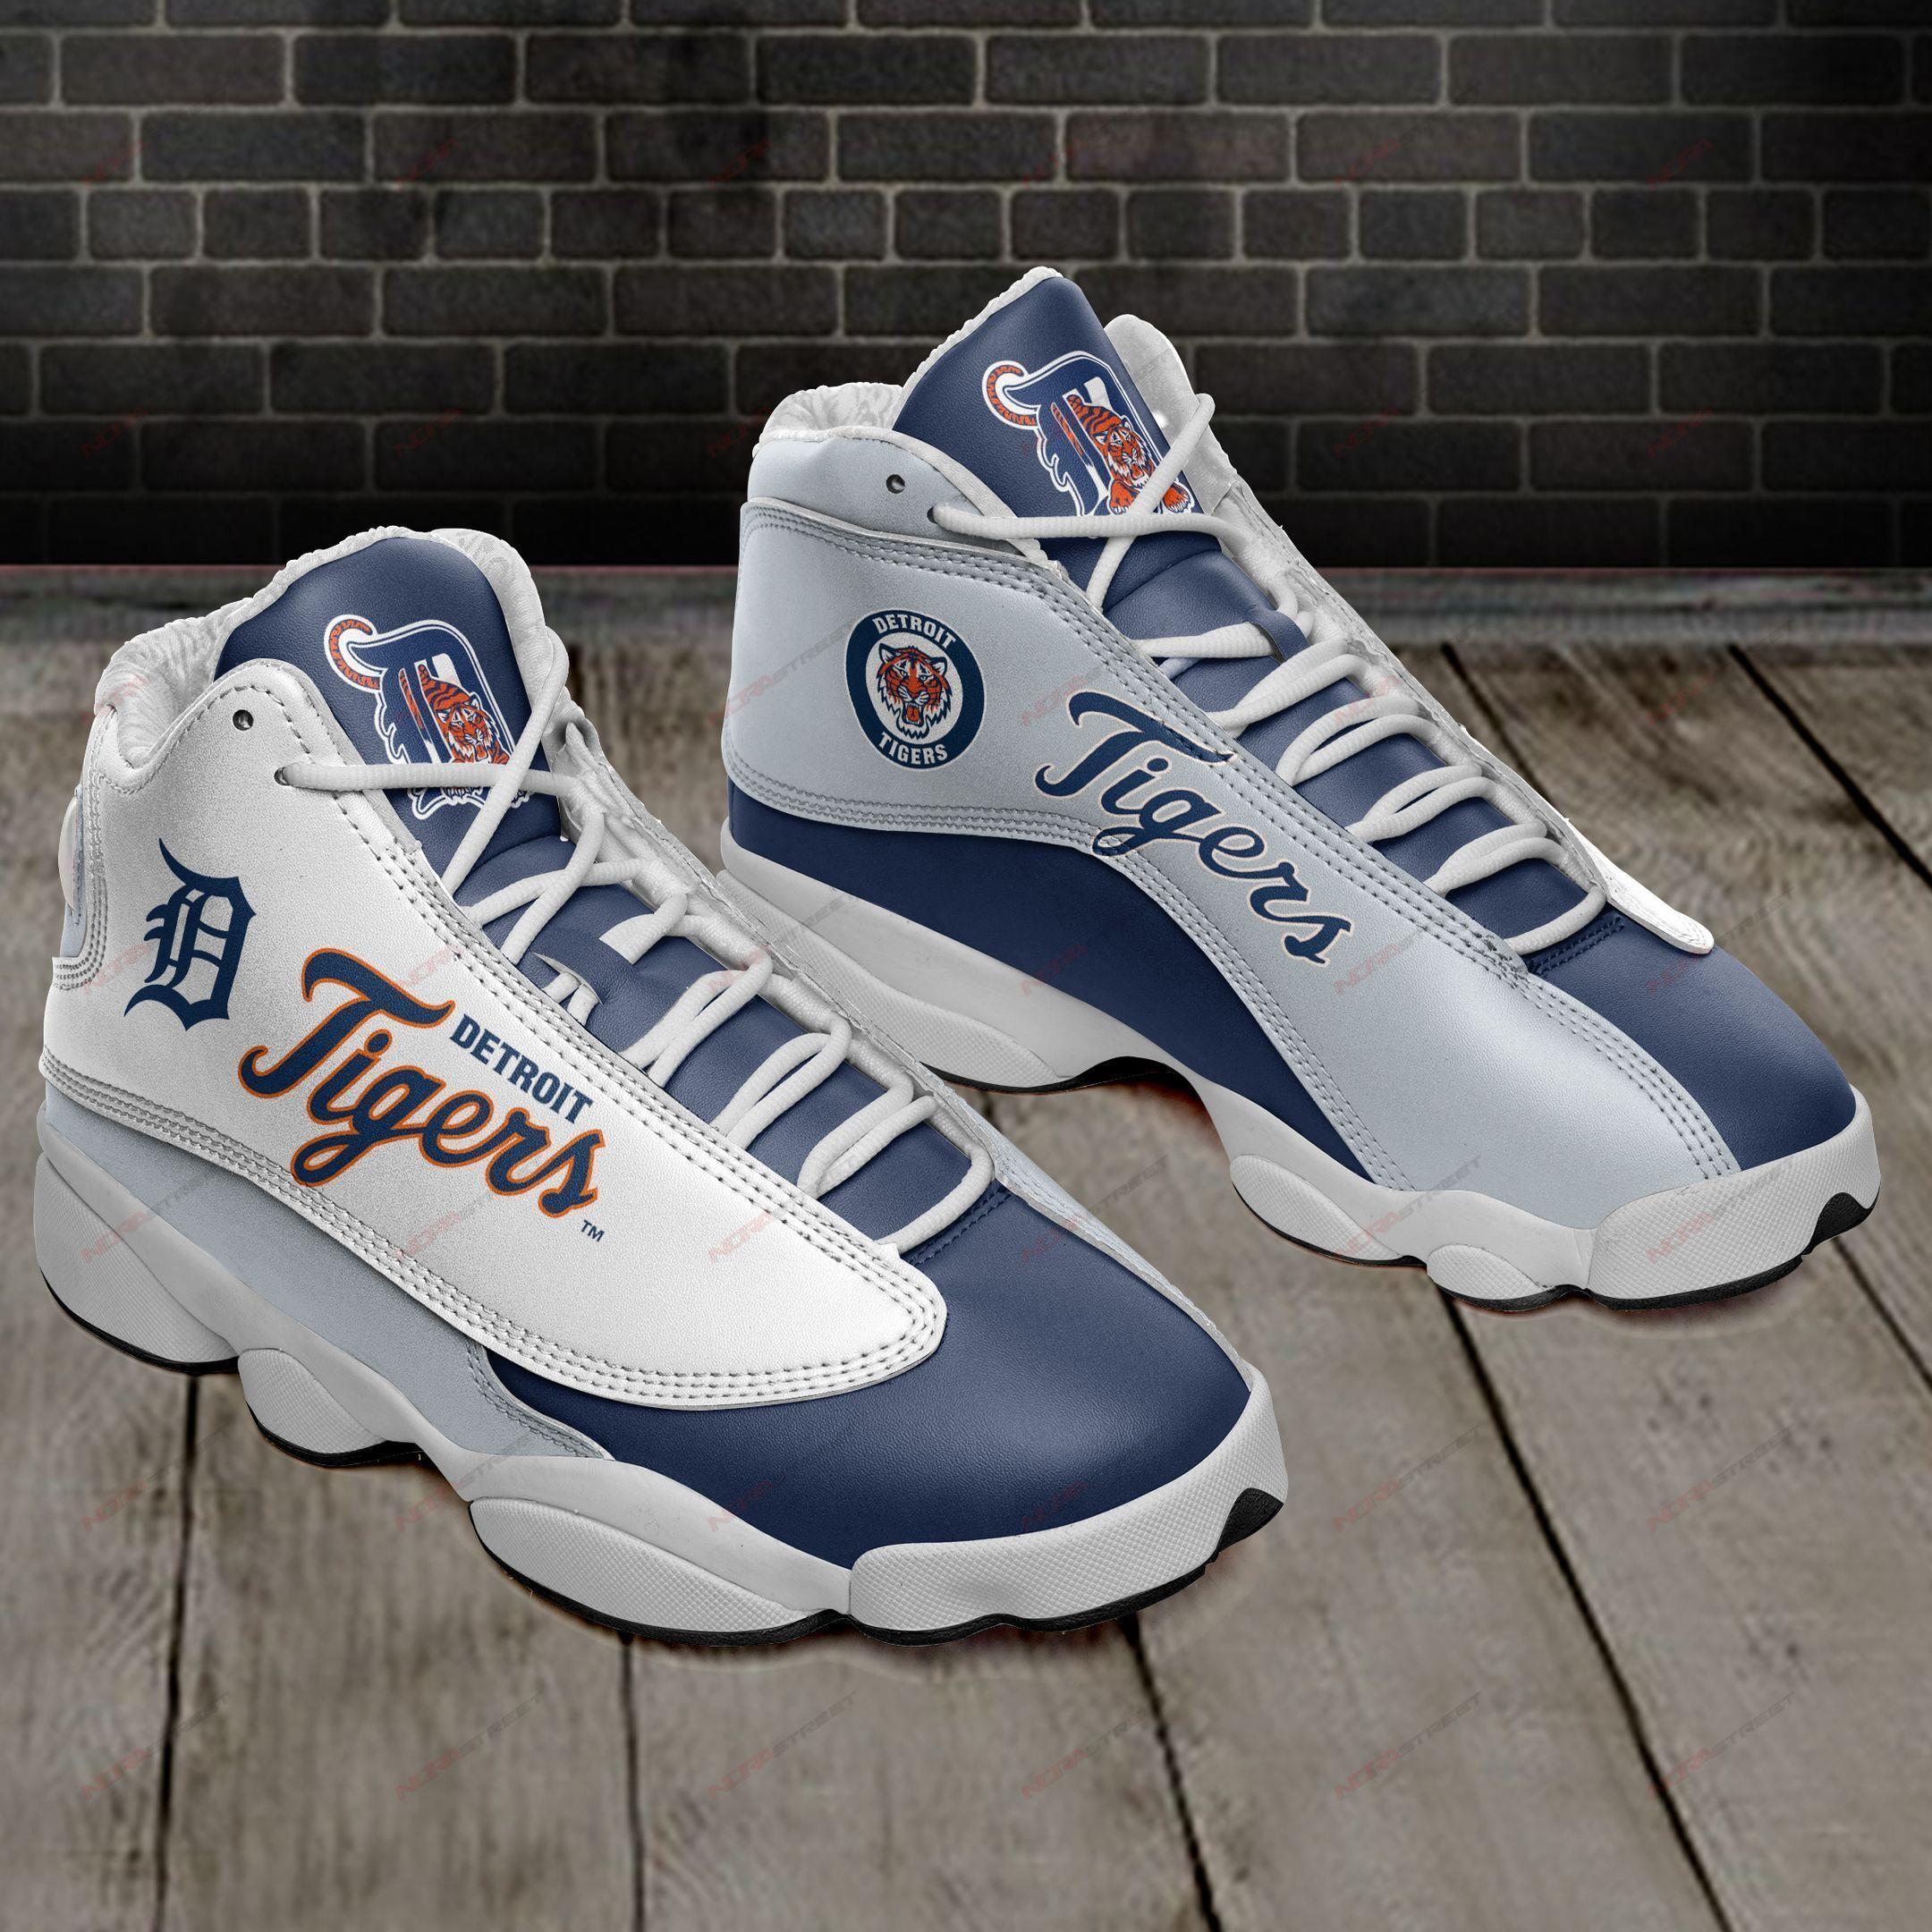 Detroit Tigers Air Jordan 13 Sneakers Sport Shoes Full Size